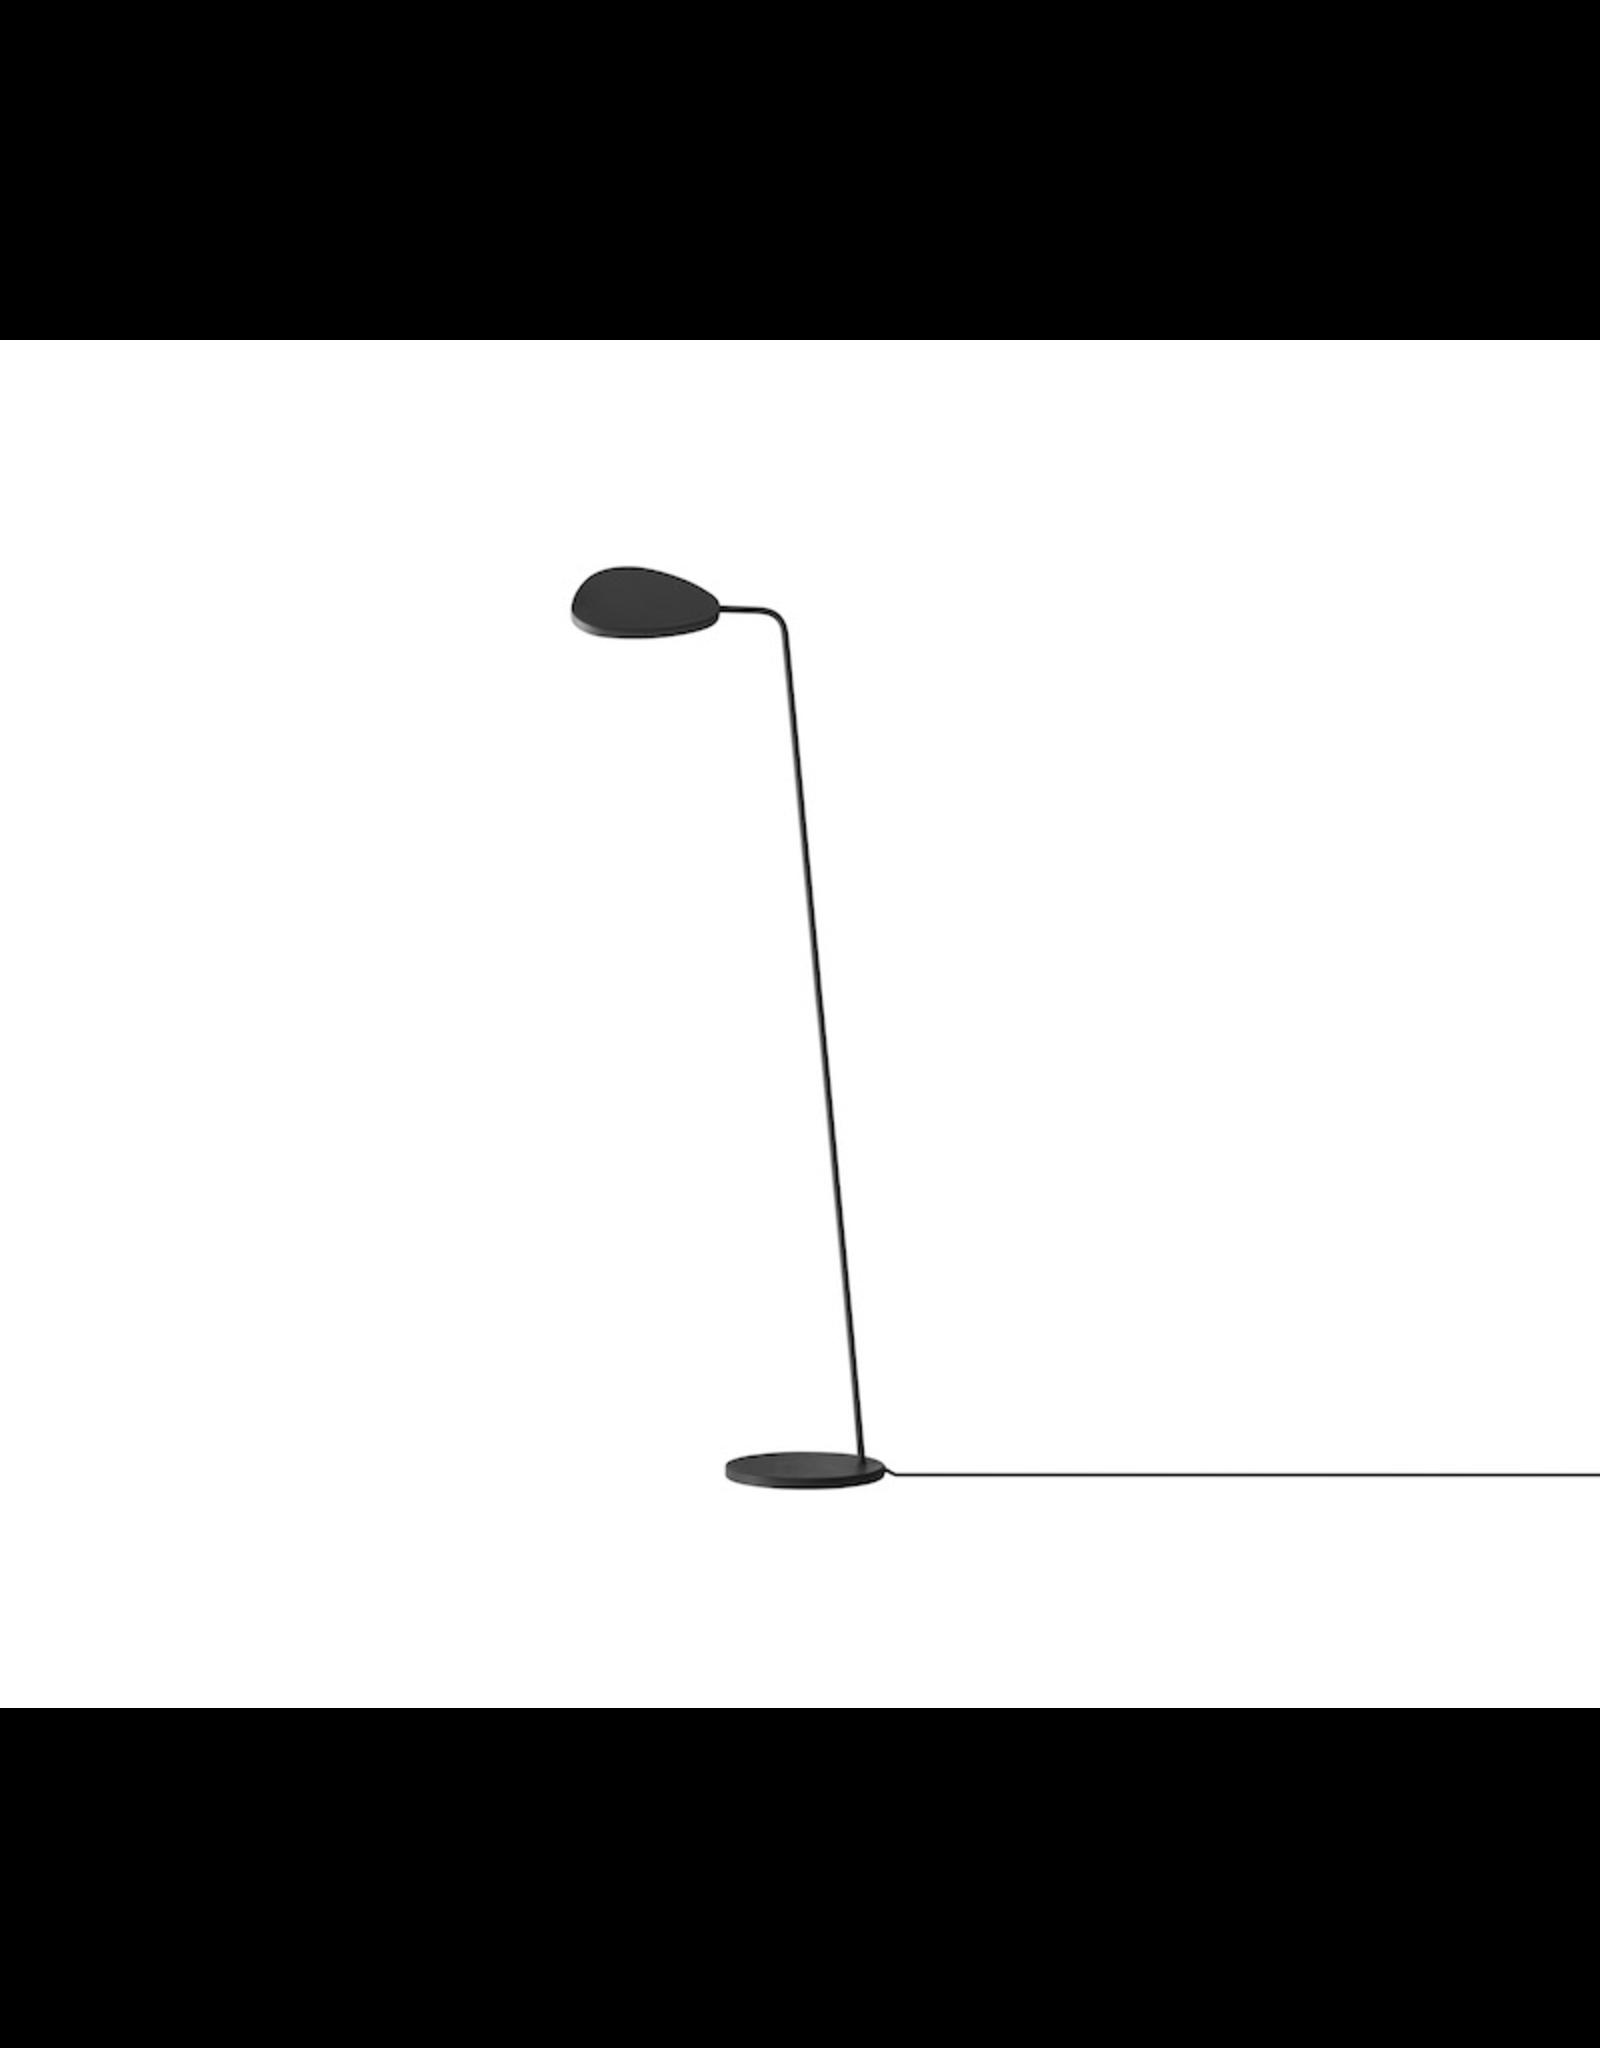 LEAF 黑色座地灯